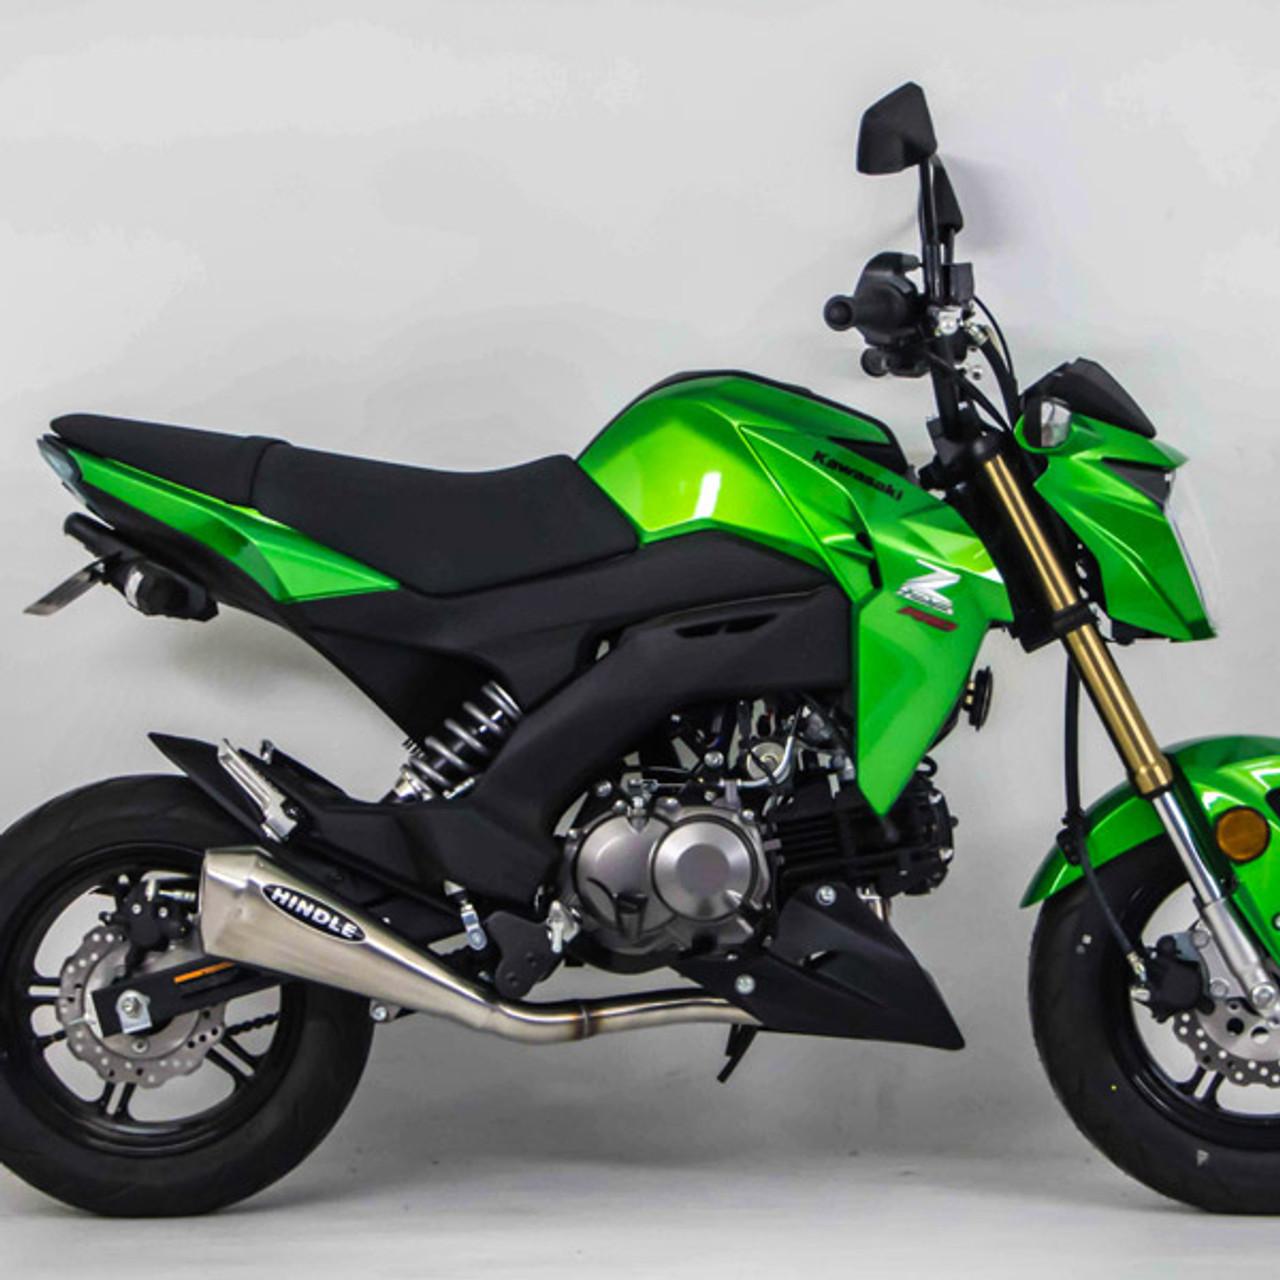 2017 Kawasaki Z125 Pro >> Hindle Evo Megaphone Polished Exhaust Kawasaki Z125 Pro 17 19